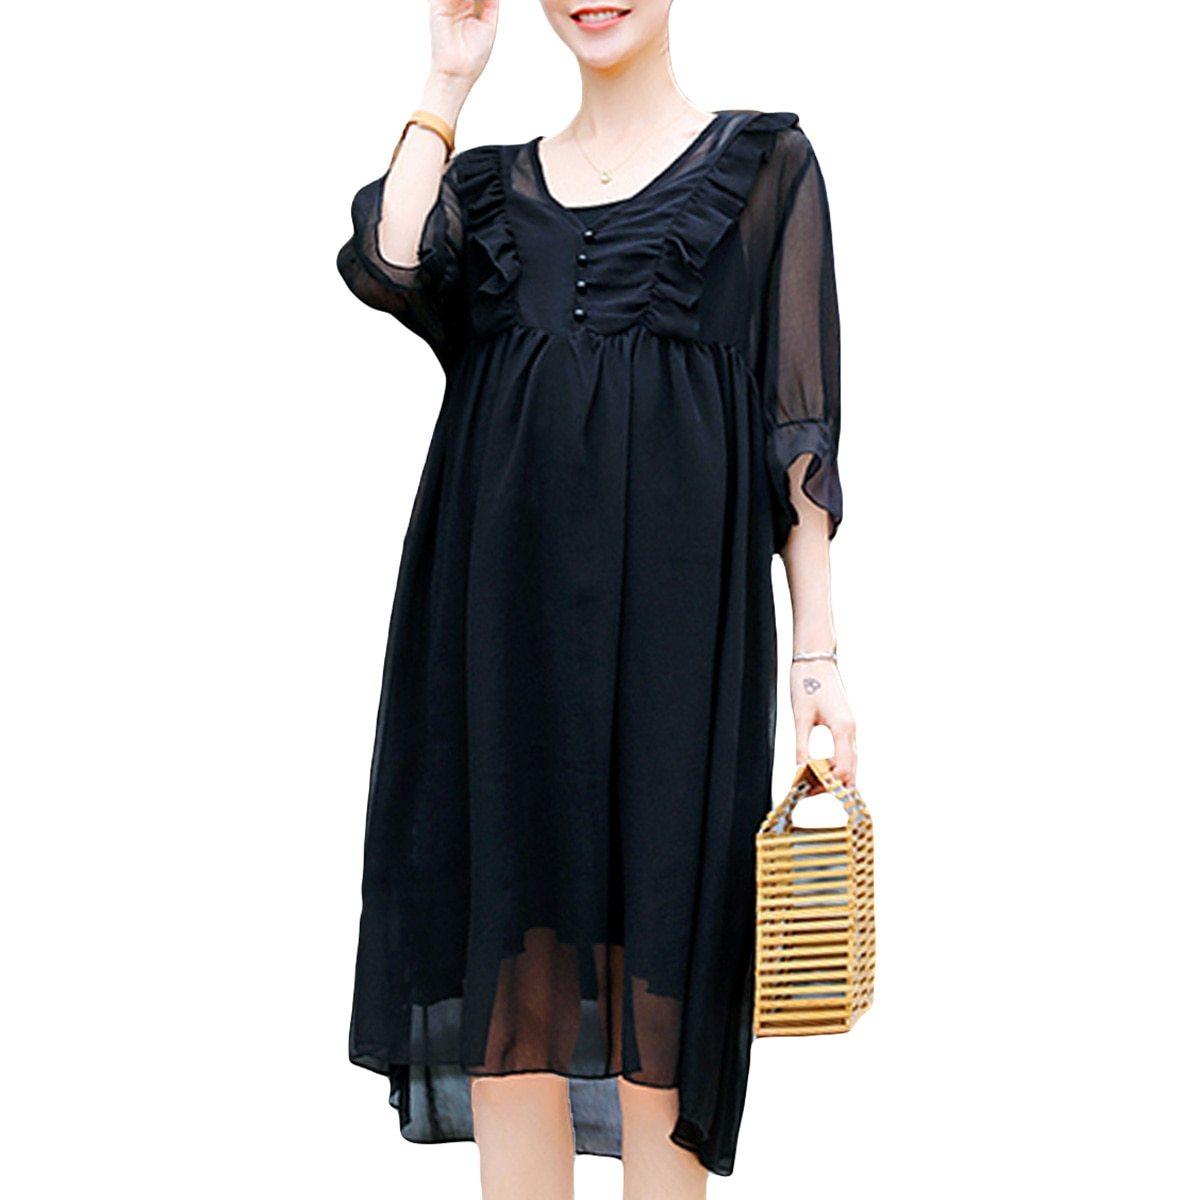 2Pcs Maternity Dress Set Fashion Solid Color V Neck Loose Casual Dresses Suit